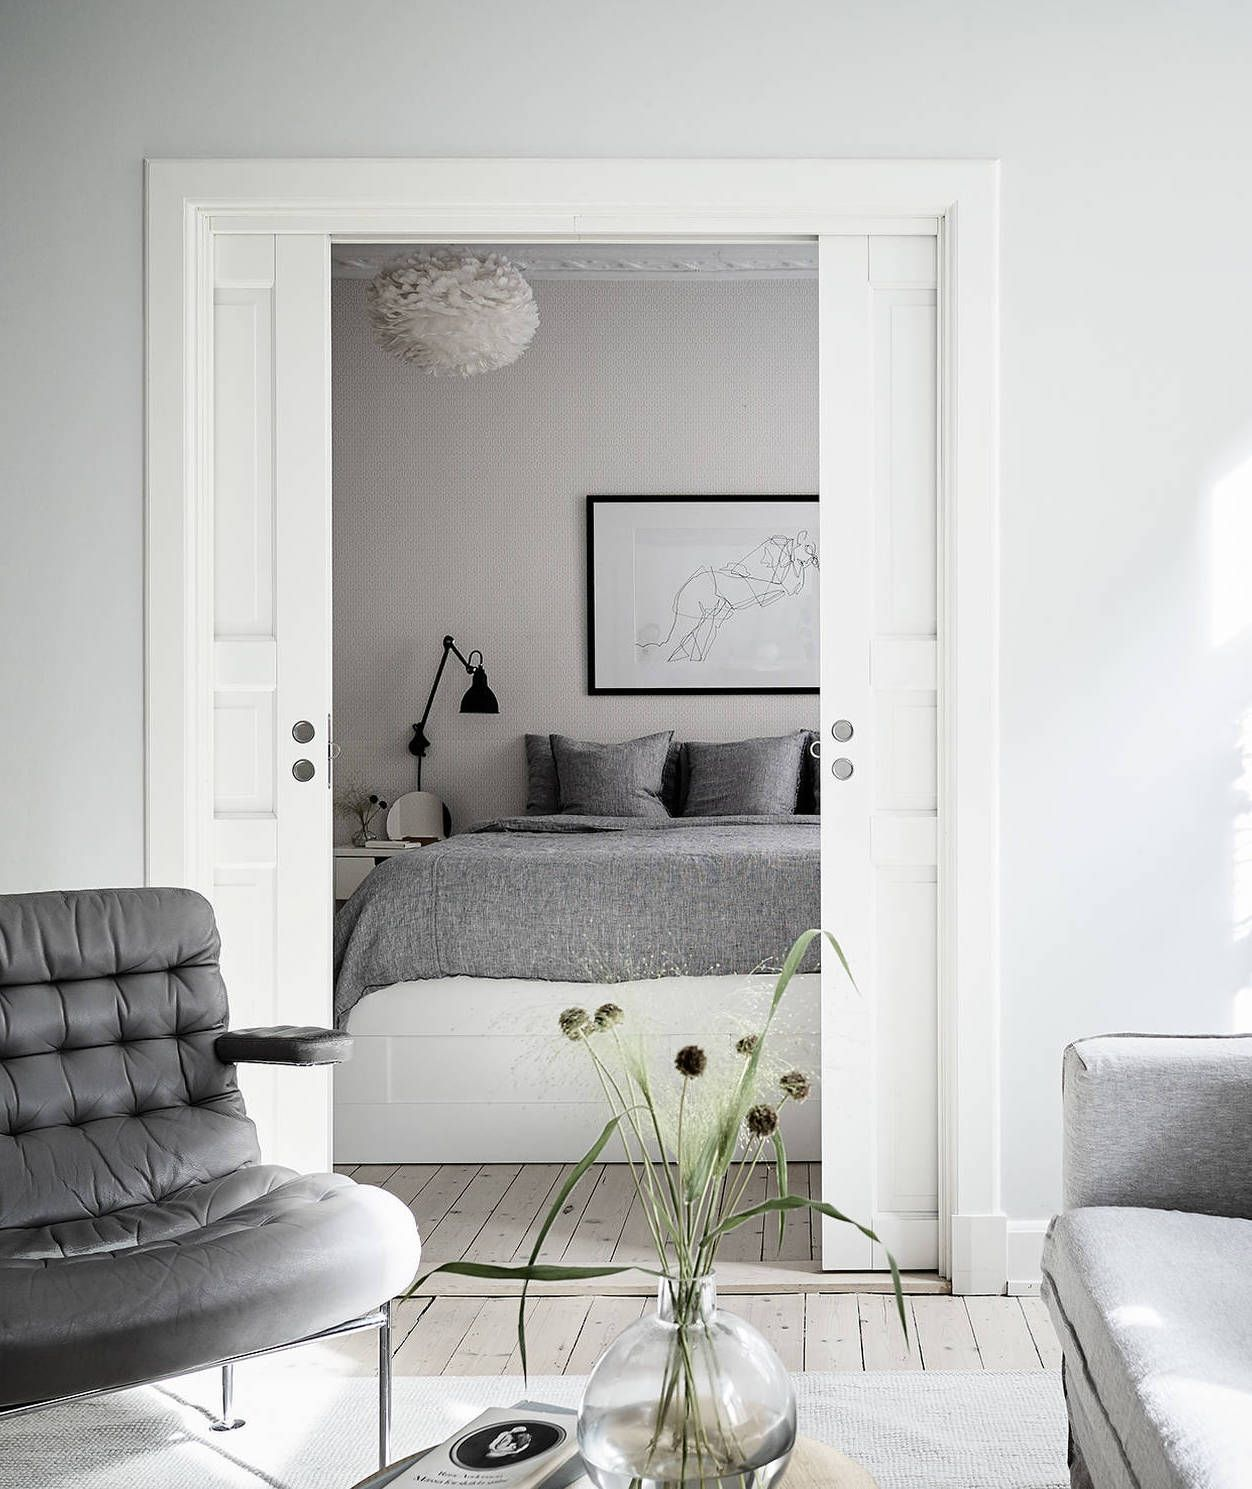 neutral home with black accents via coco lapine design blog scandinavian design pinterest black accents interiors and bedrooms - Scandinavian Design Blogs